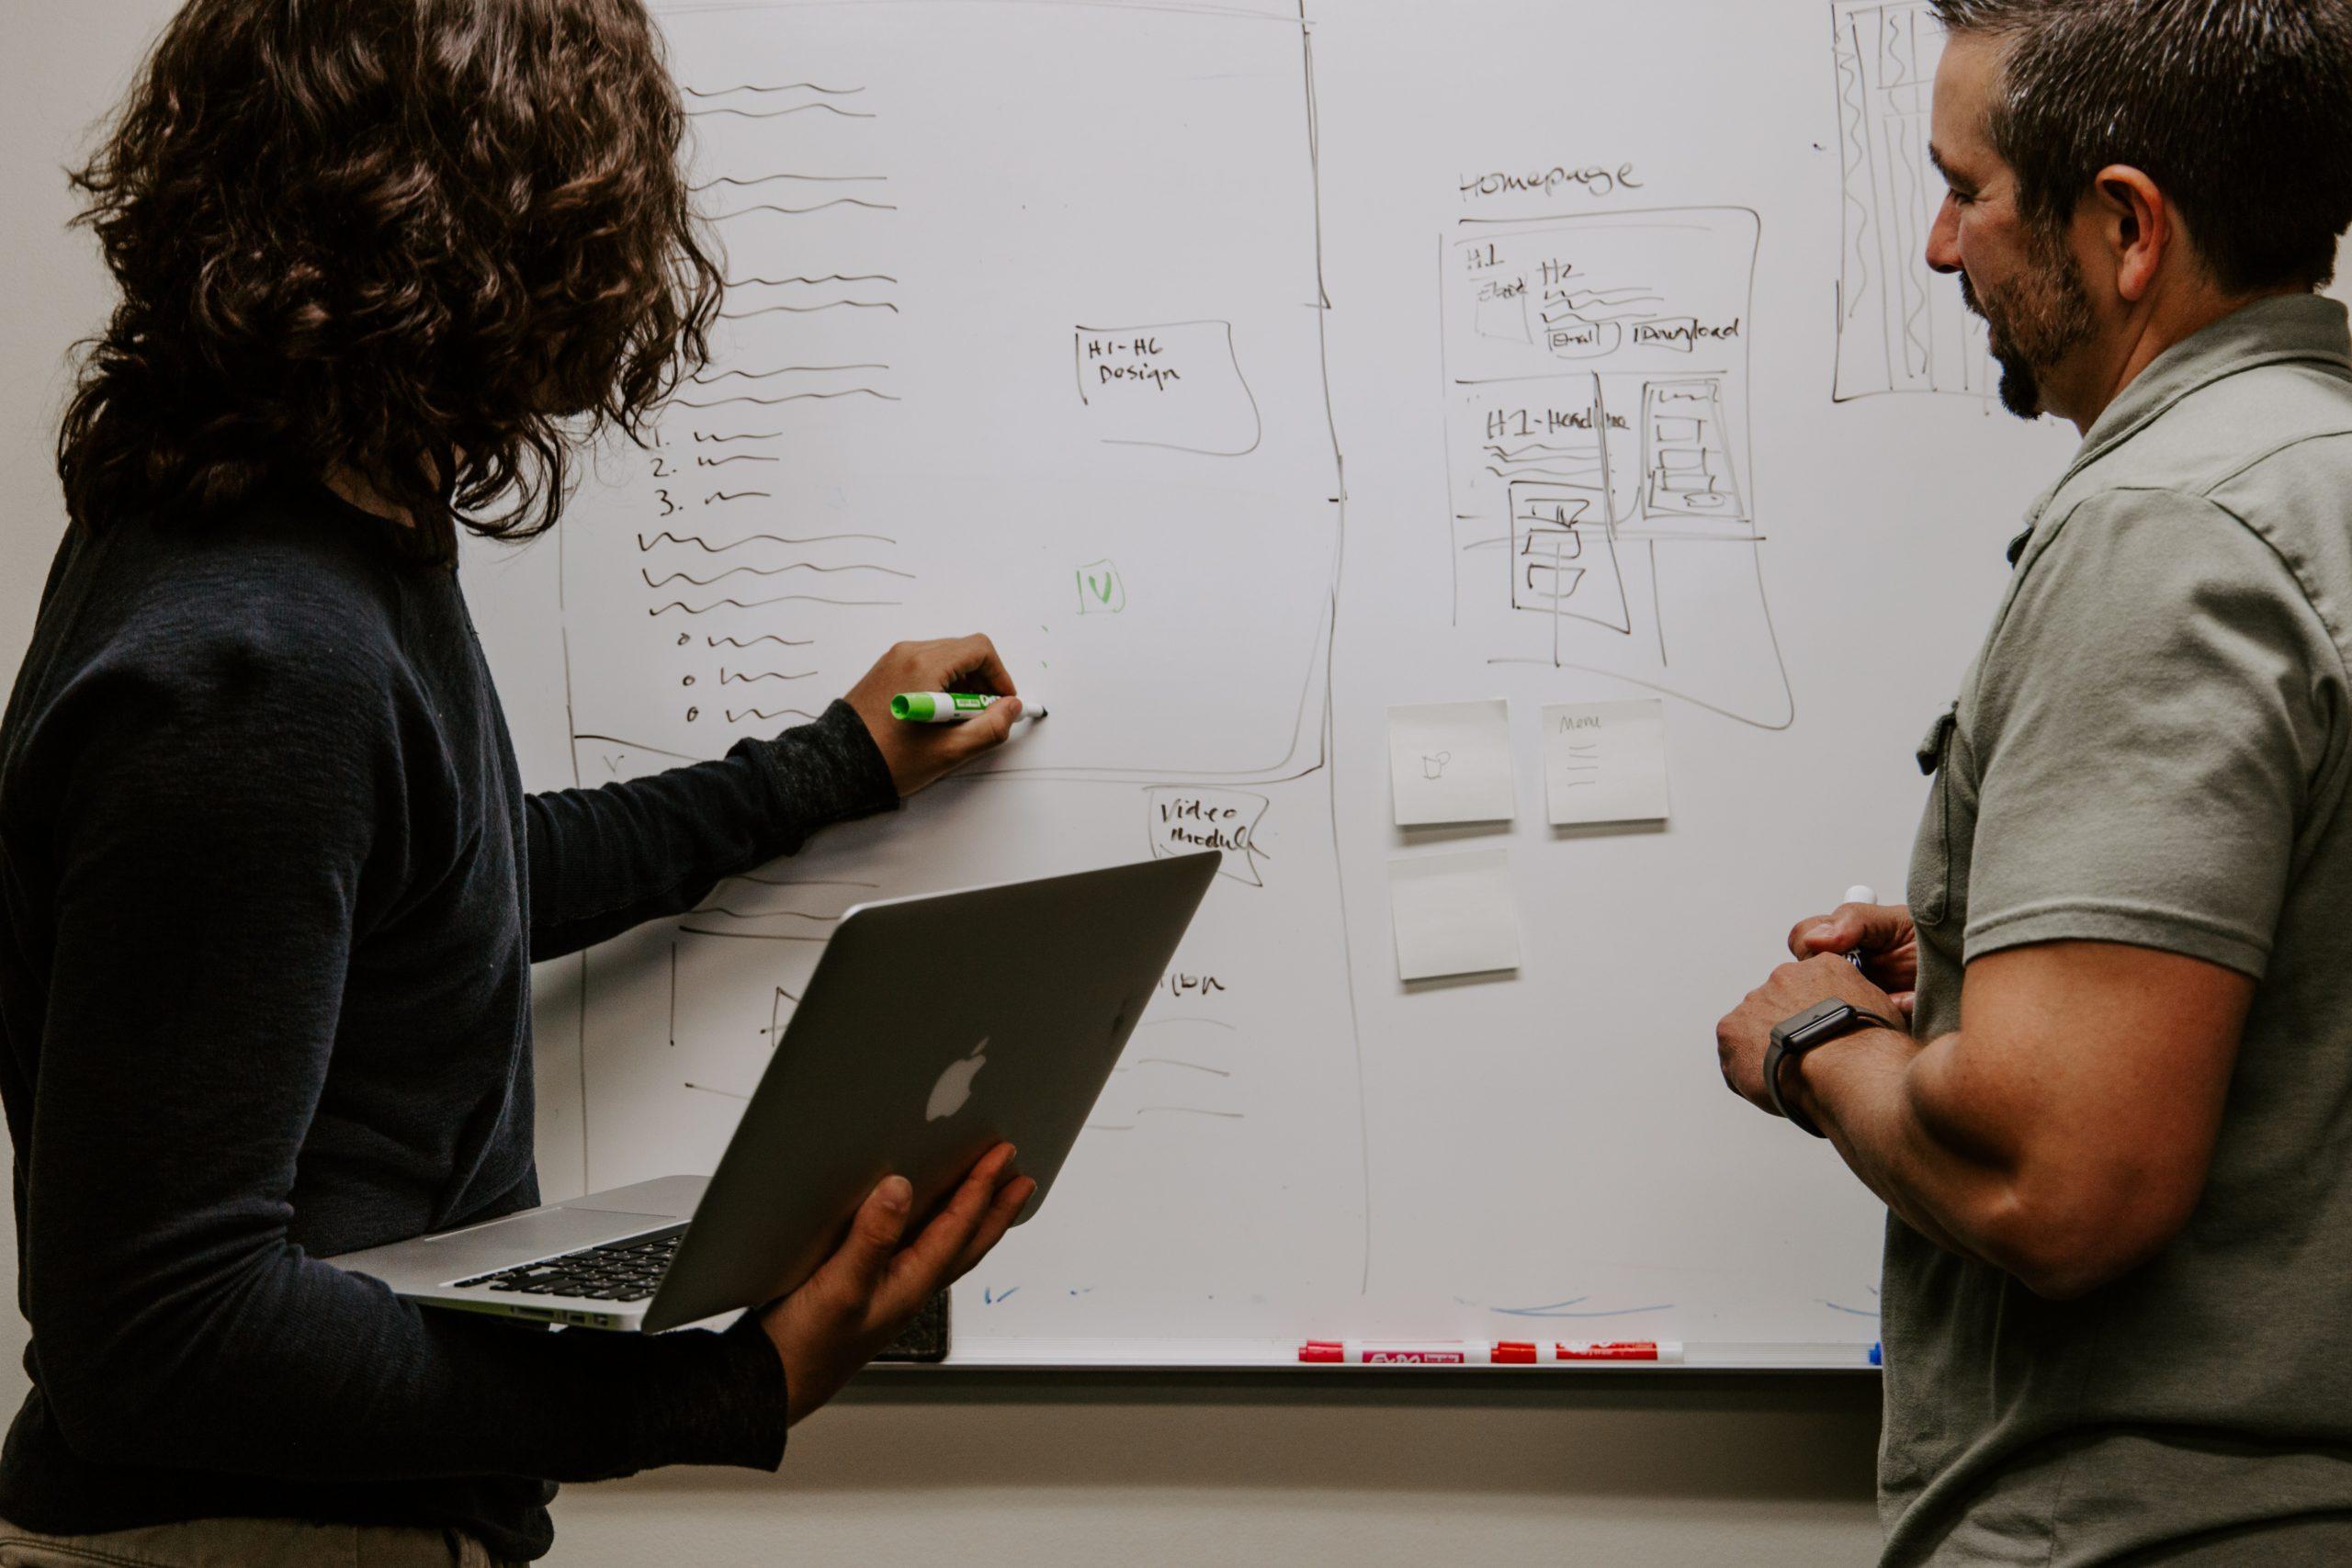 Strategieberatung am Whiteboard